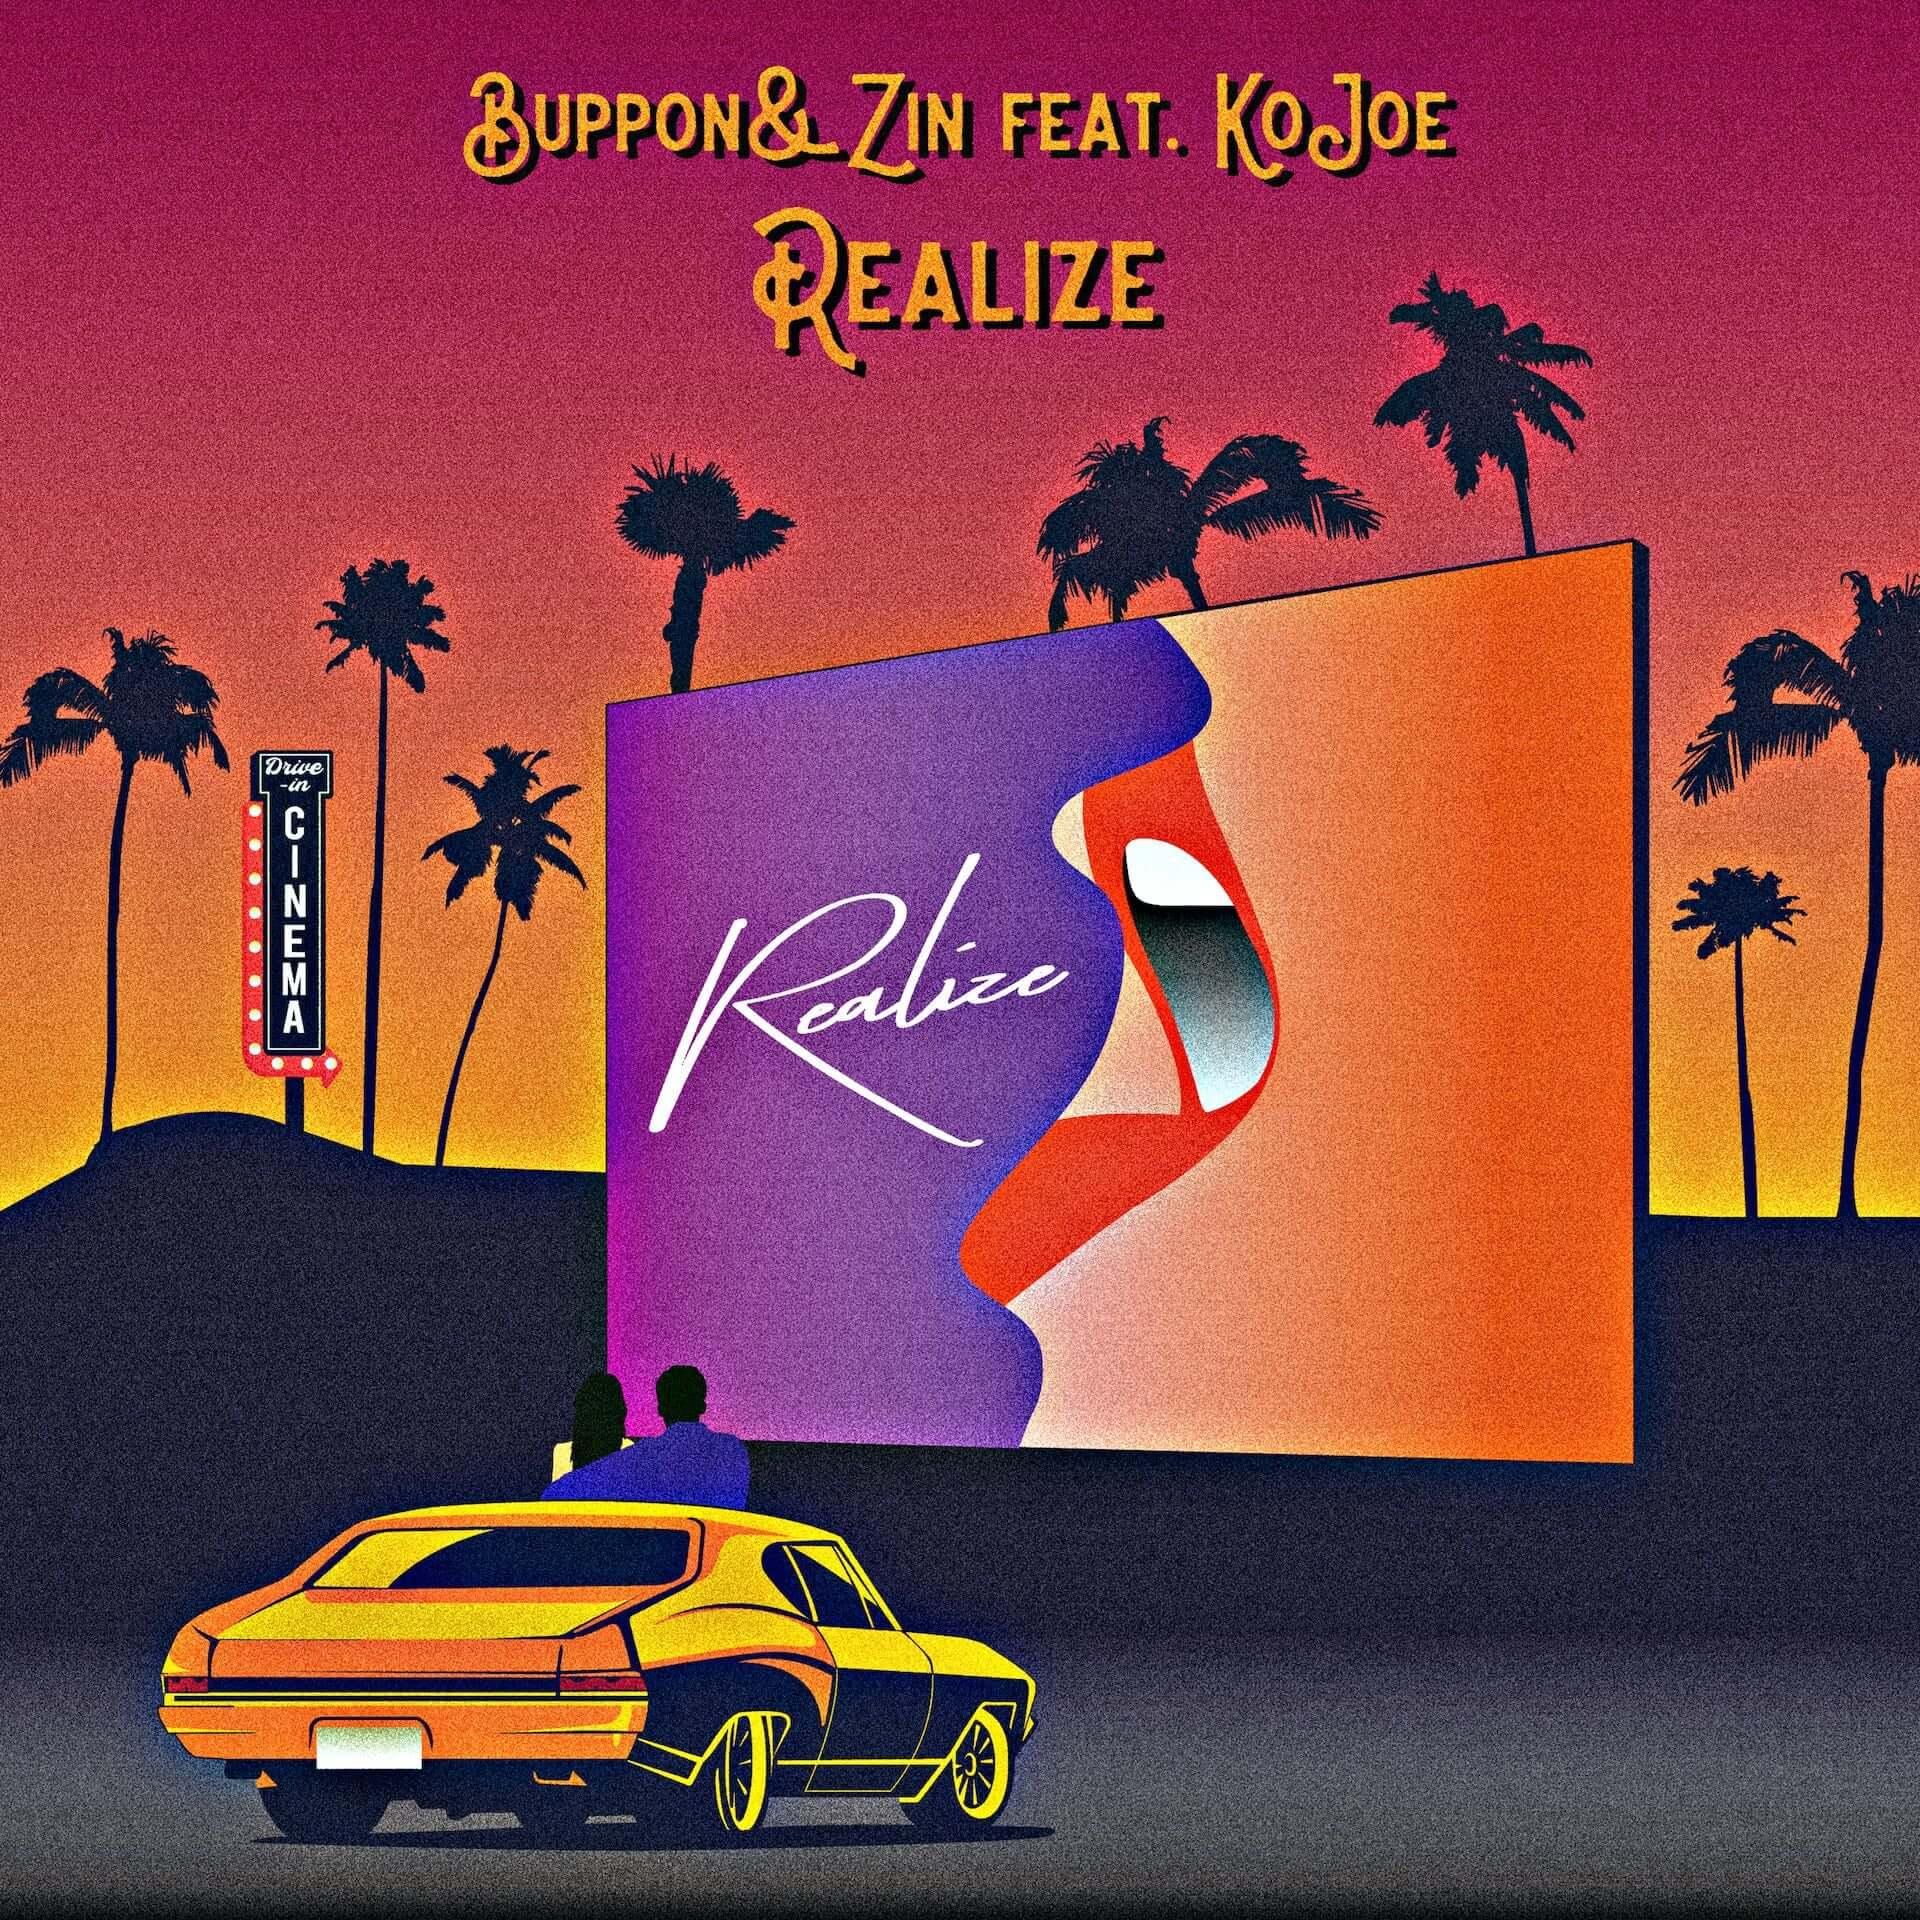 BUPPONとSoulflexのZINによるWネームシングル!KOJOEを迎えた新曲「Realize」が本日リリース music200401_zin_buppon_2-1920x1920